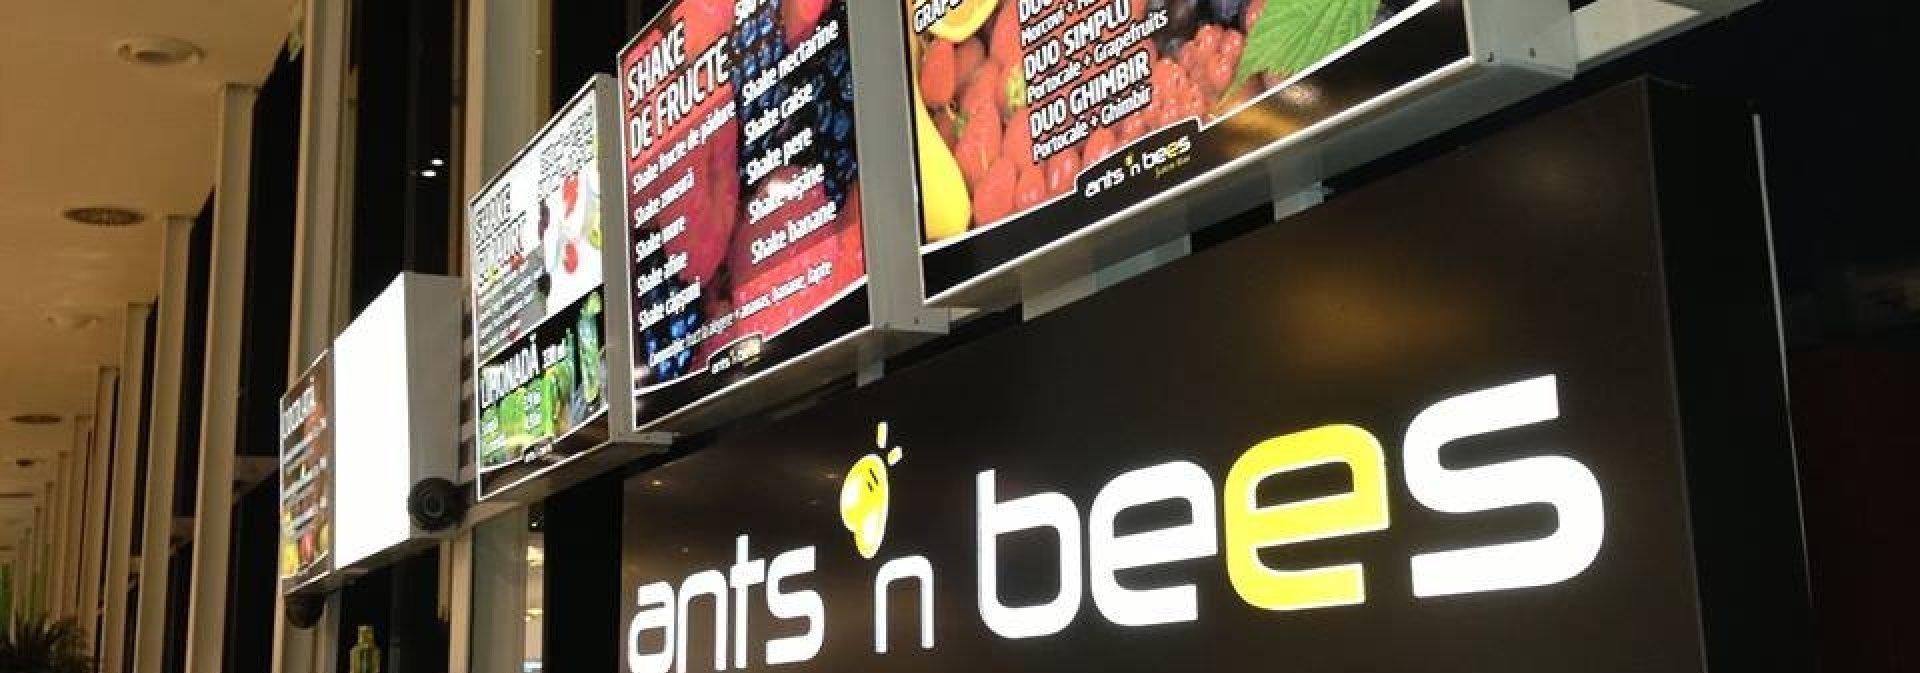 Ants n Bees, Iași